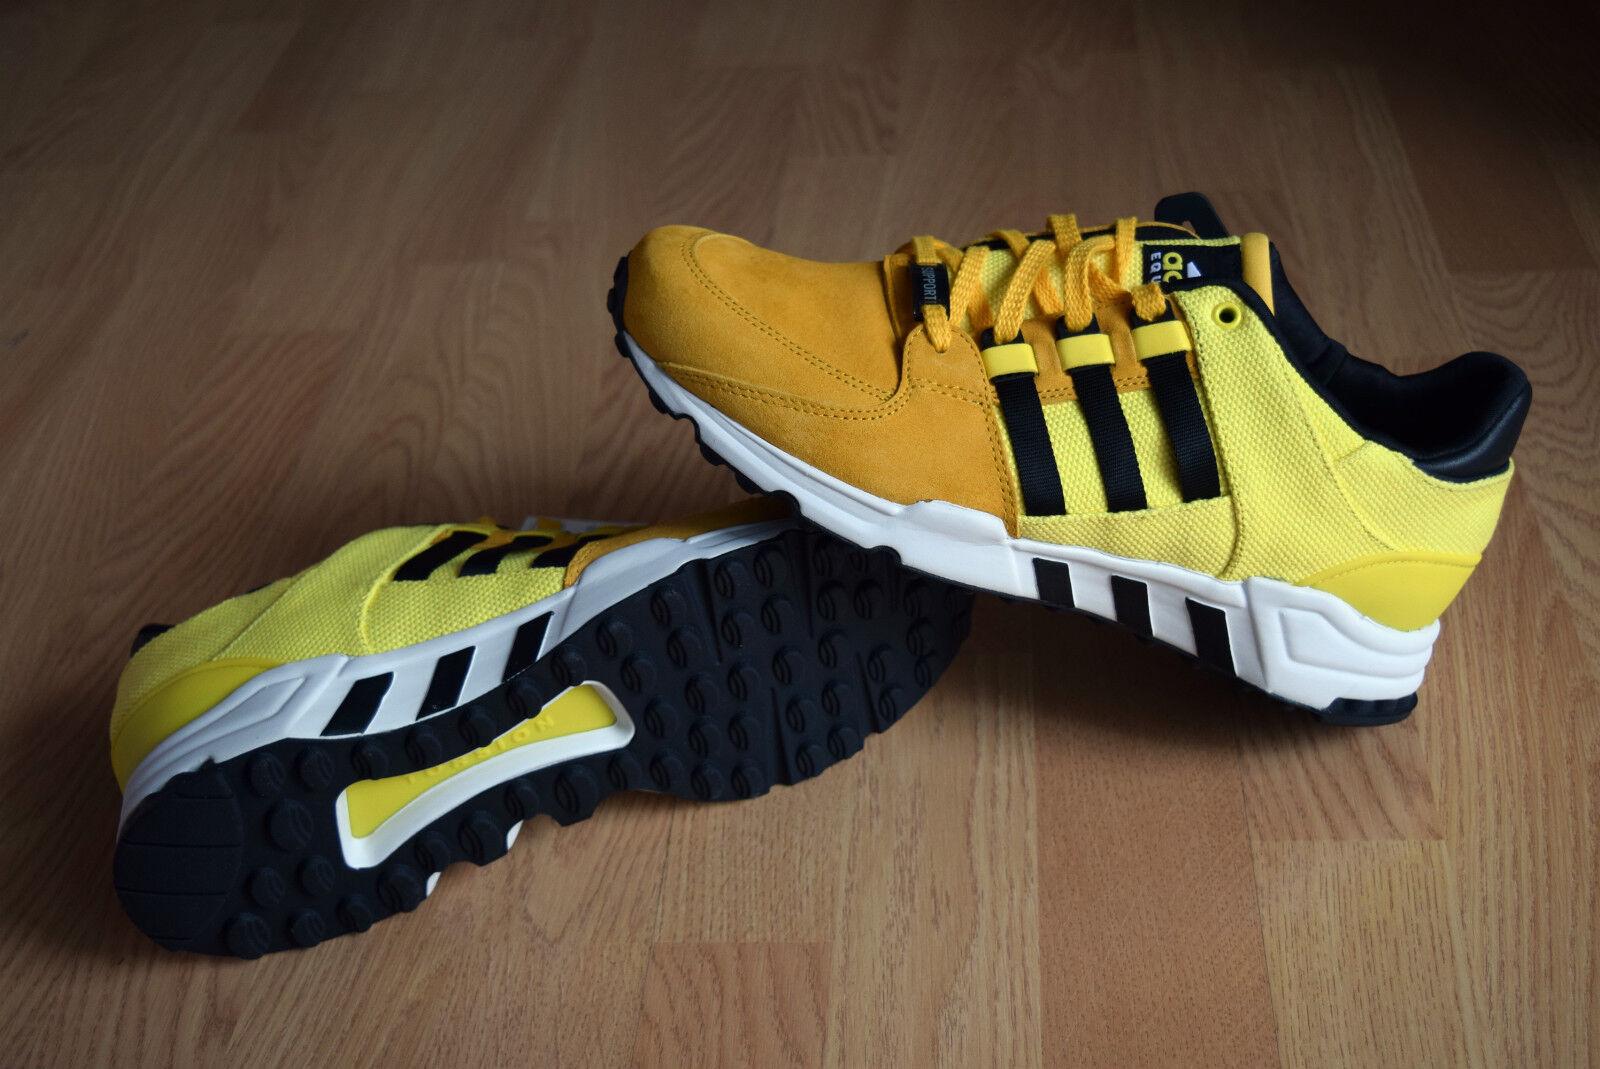 Adidas Equipment Support Running 43 B40401 44 44,5 45 46 B40401 43 cOnSorTium guidance 93 026ee7